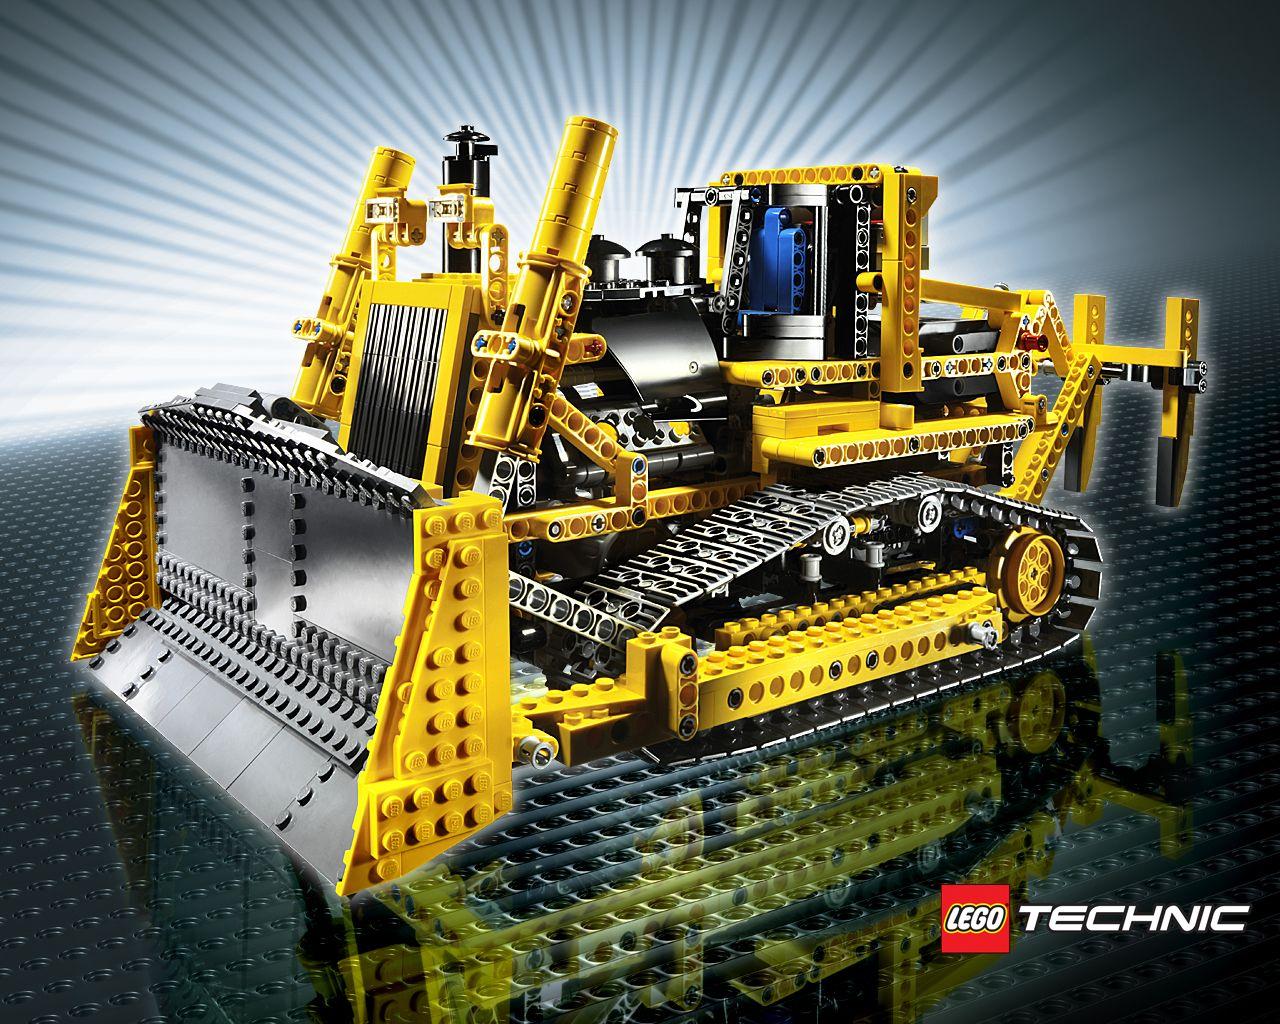 tech toys for kids lego technic lego technic. Black Bedroom Furniture Sets. Home Design Ideas